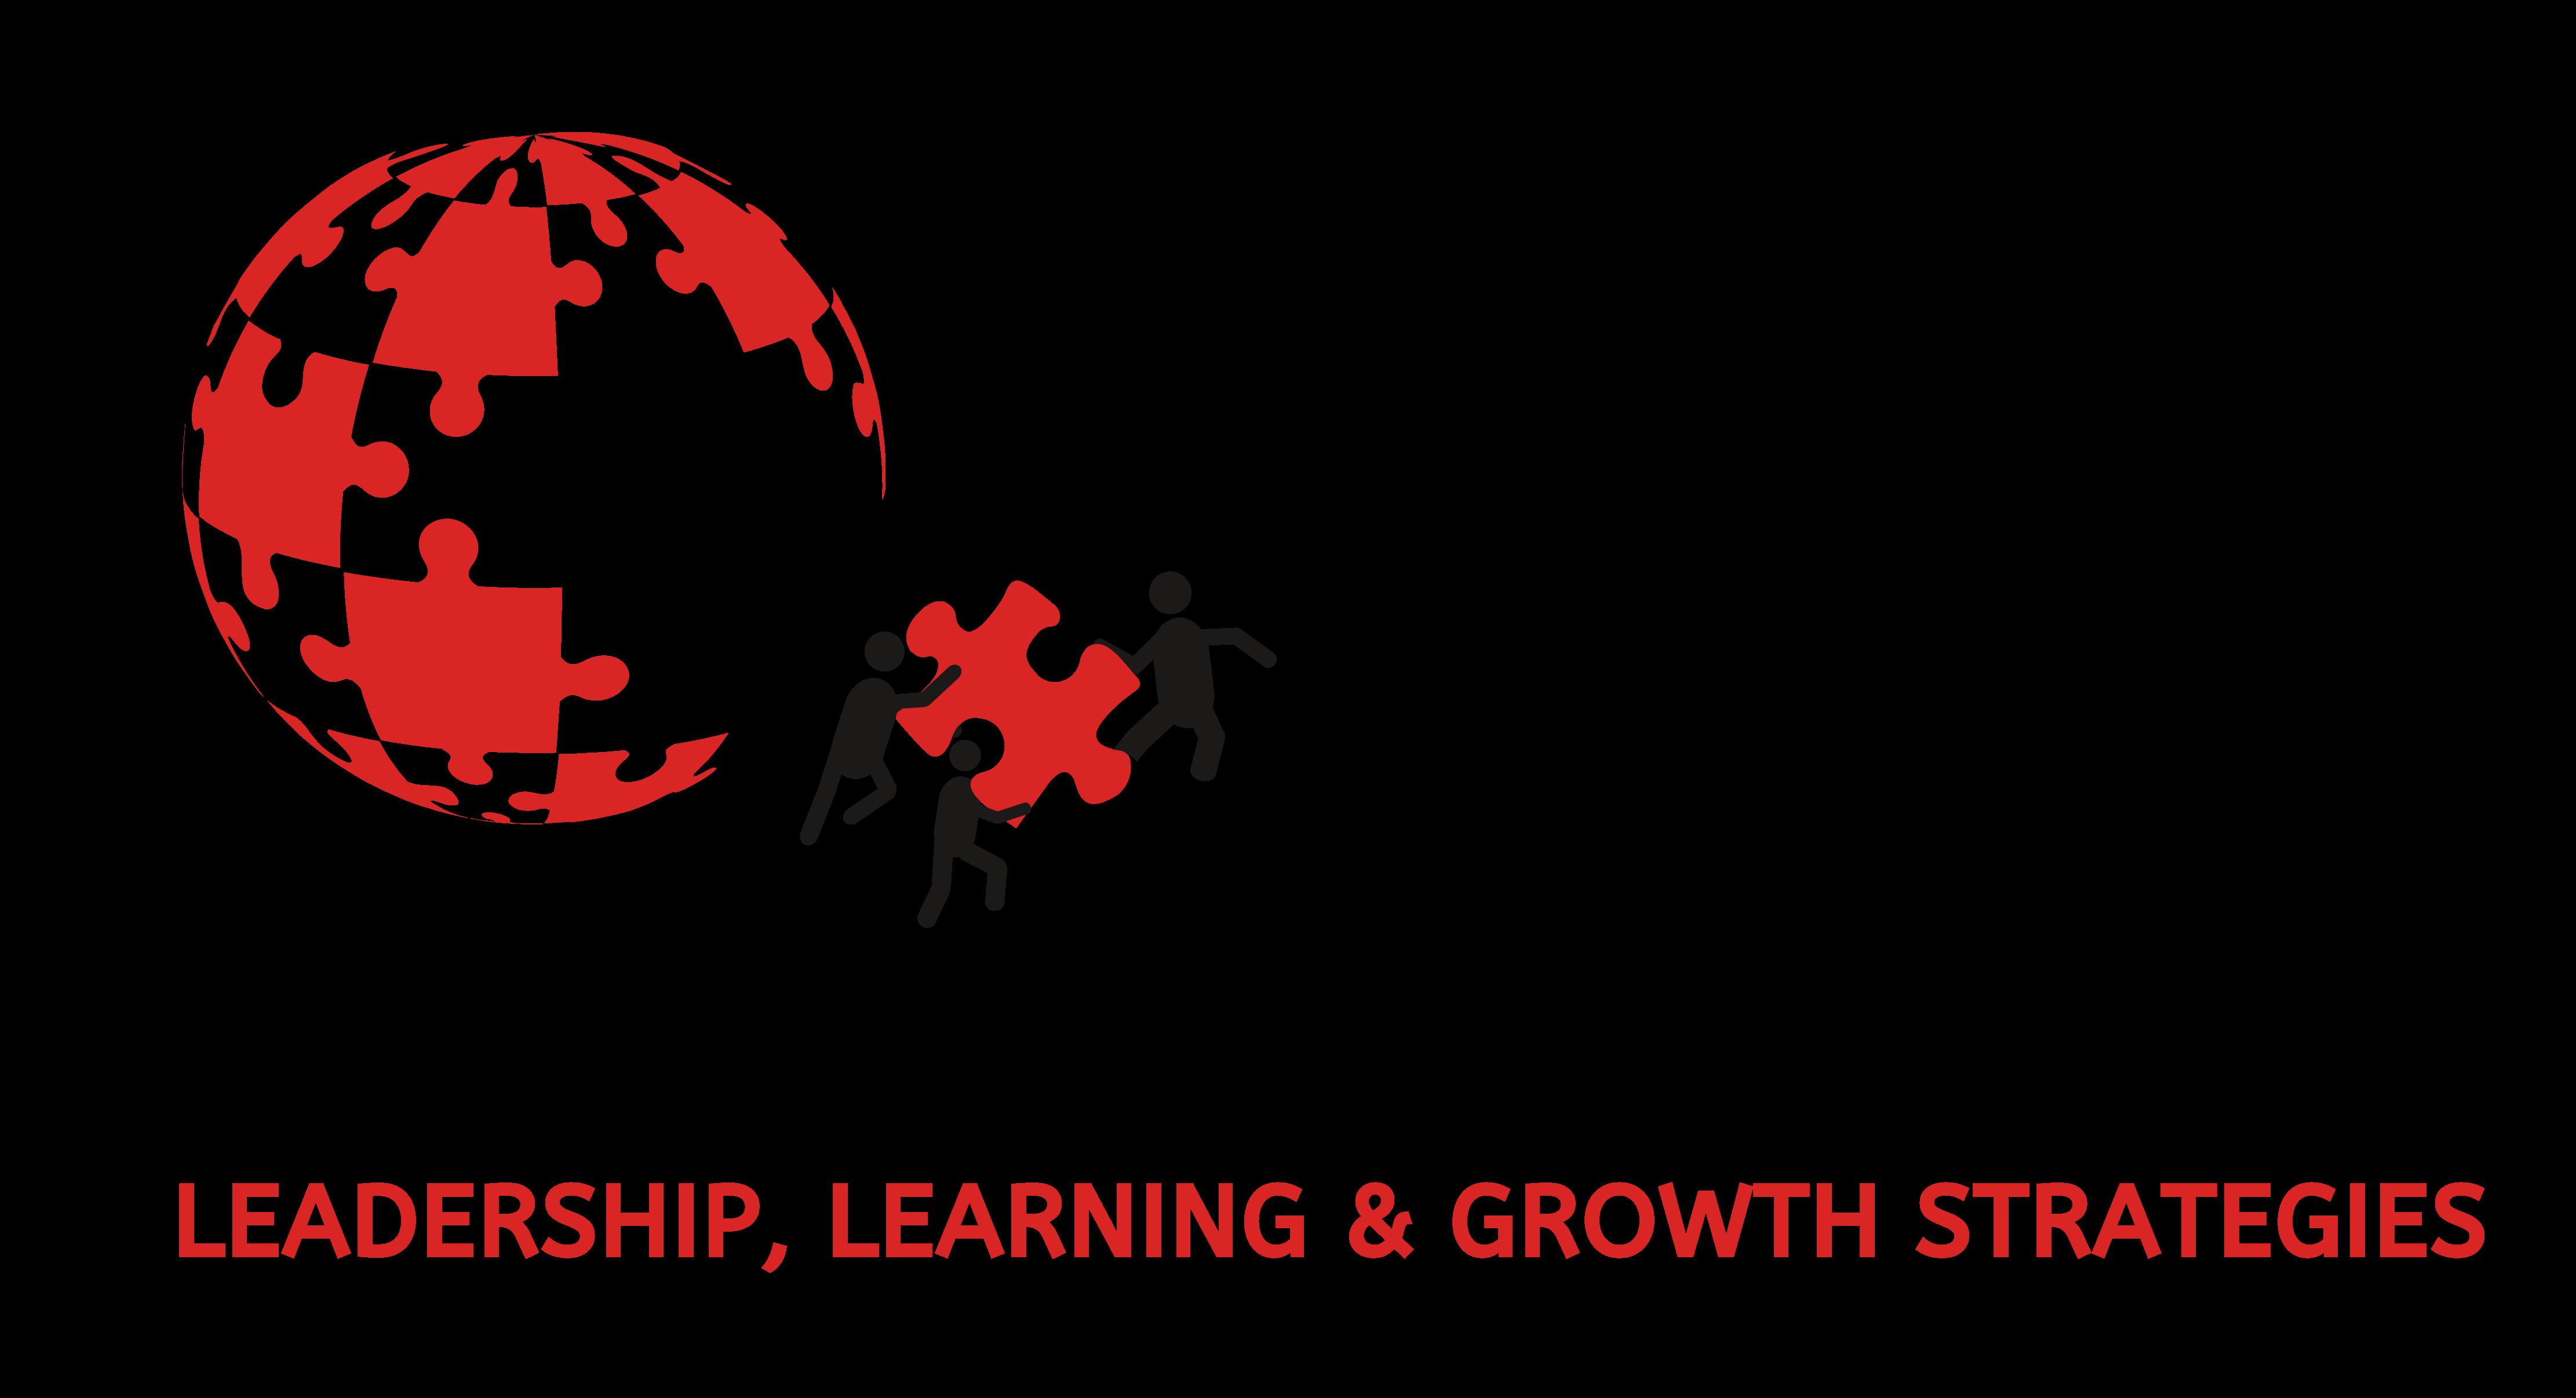 croped Logo Transparent Background